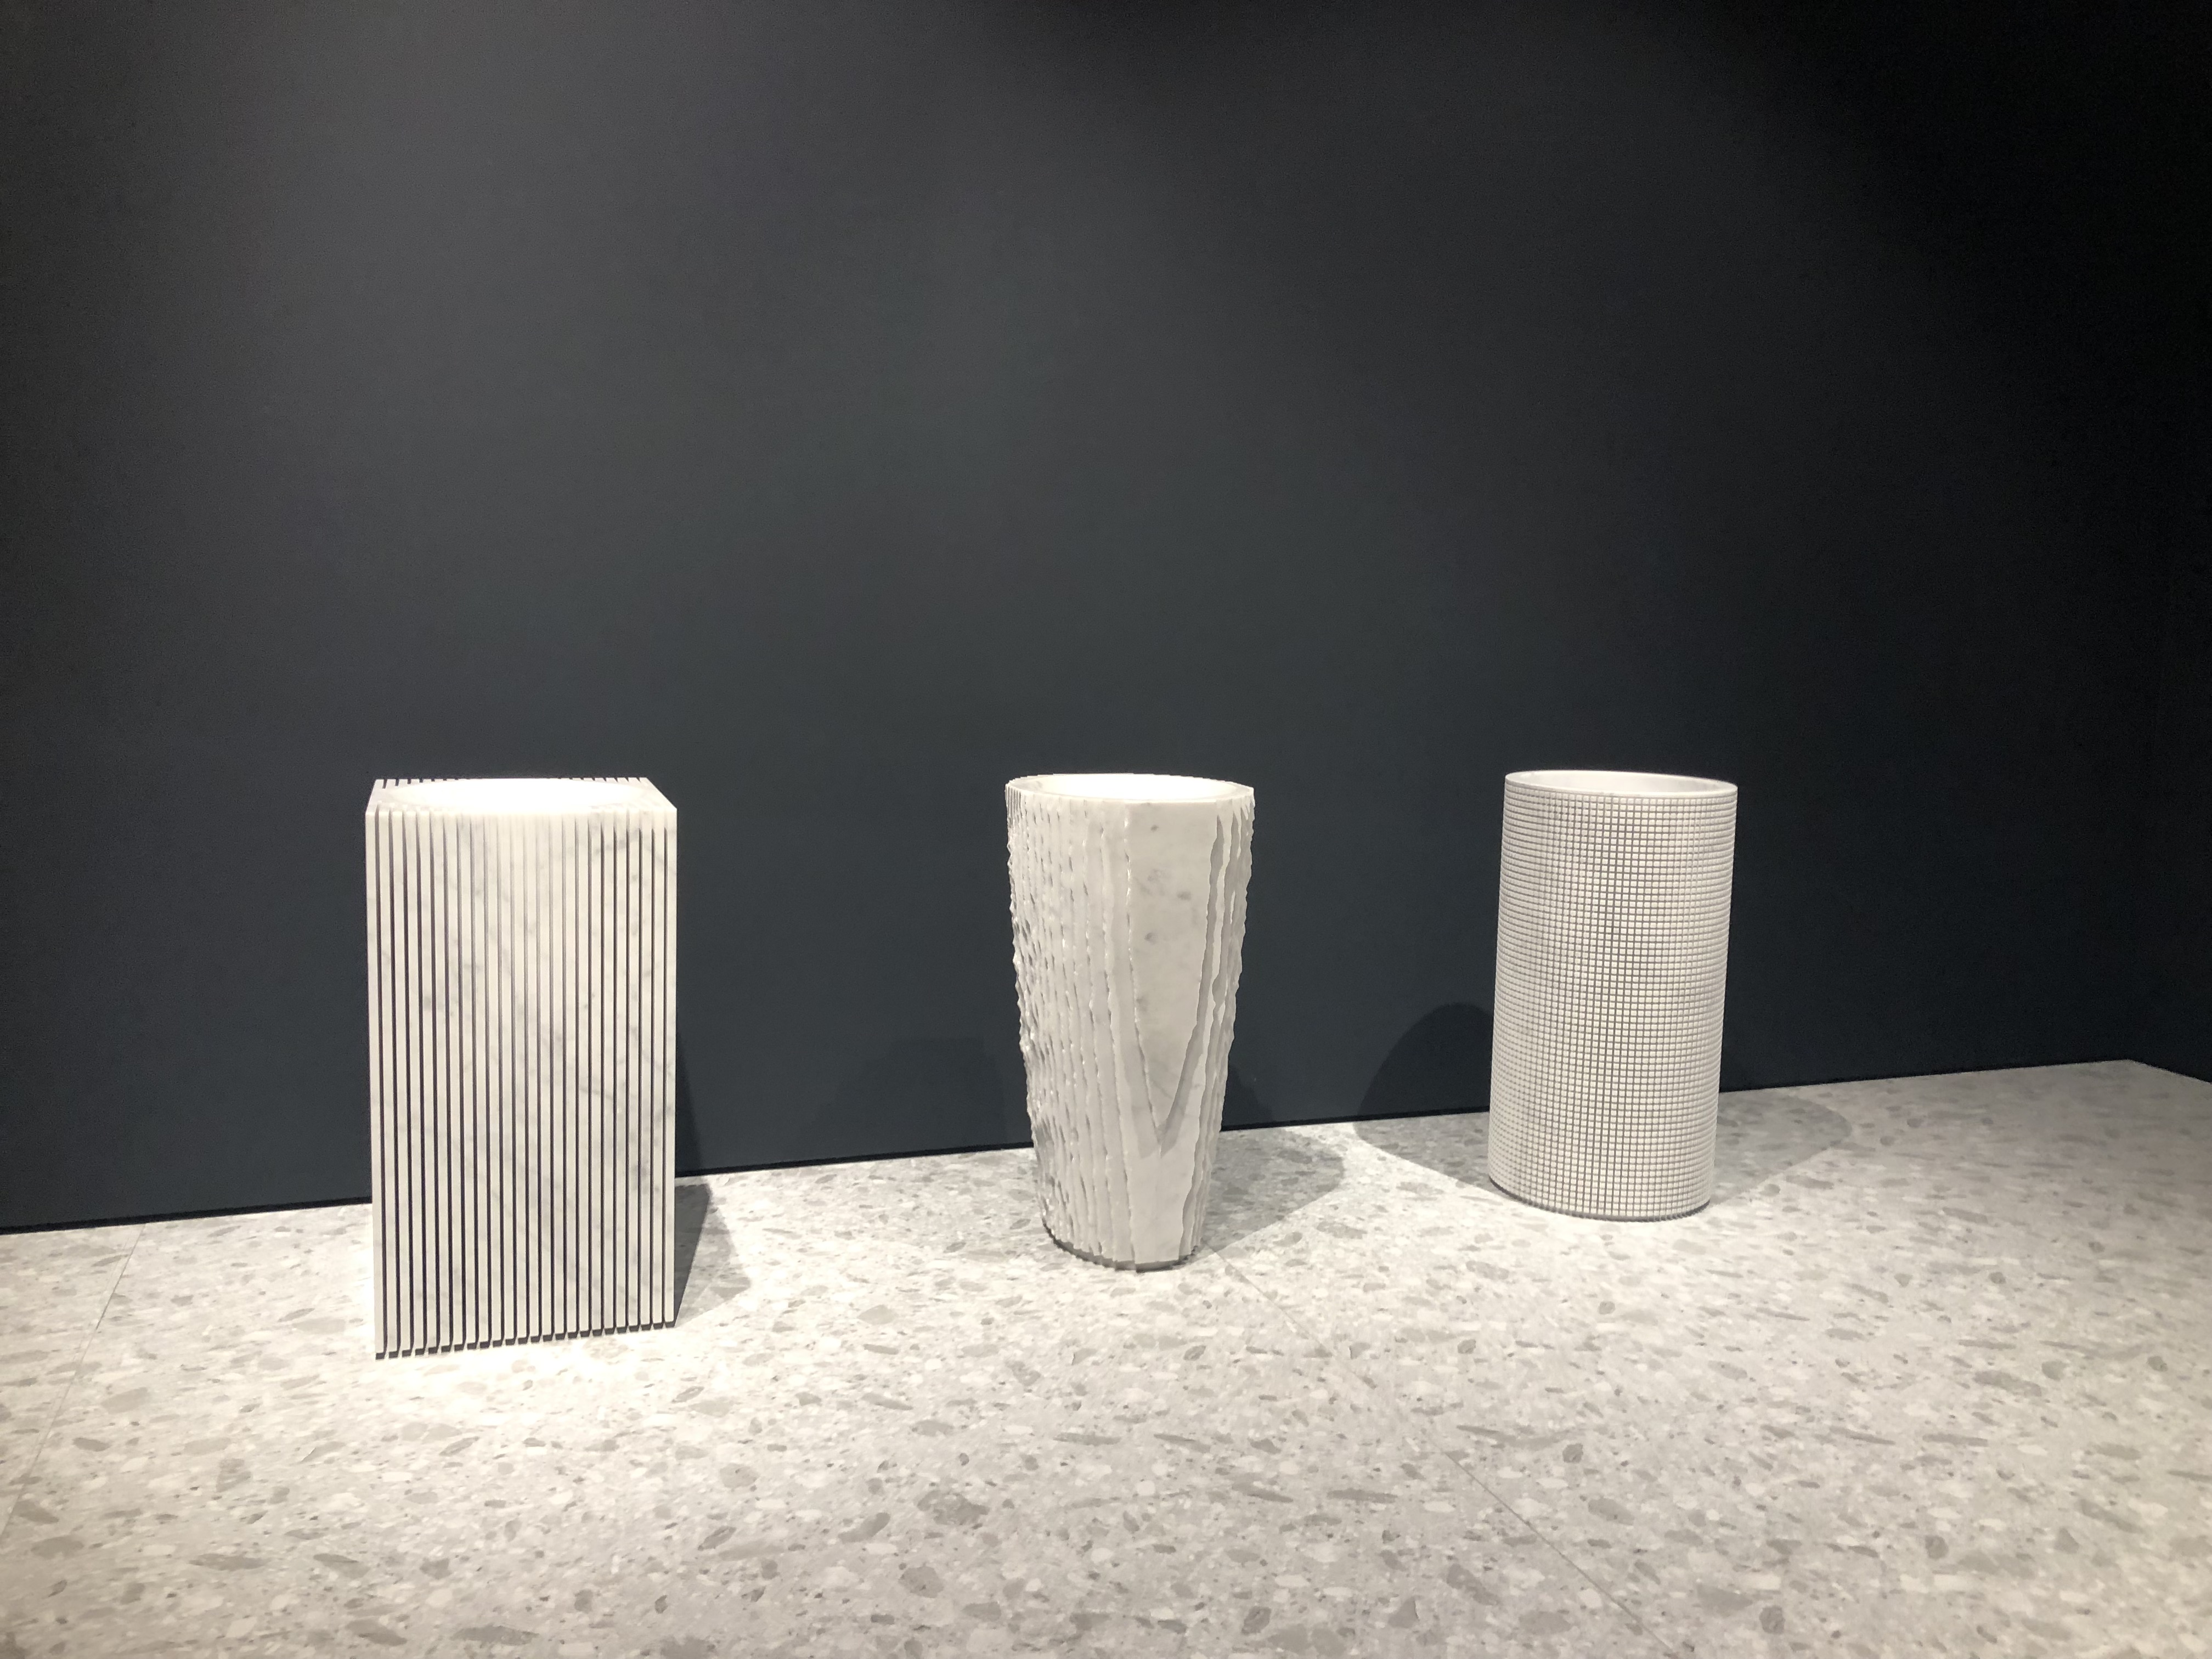 Sinks display by antonionlupi design at Salon Del Mobile, Milan Design Week 2019